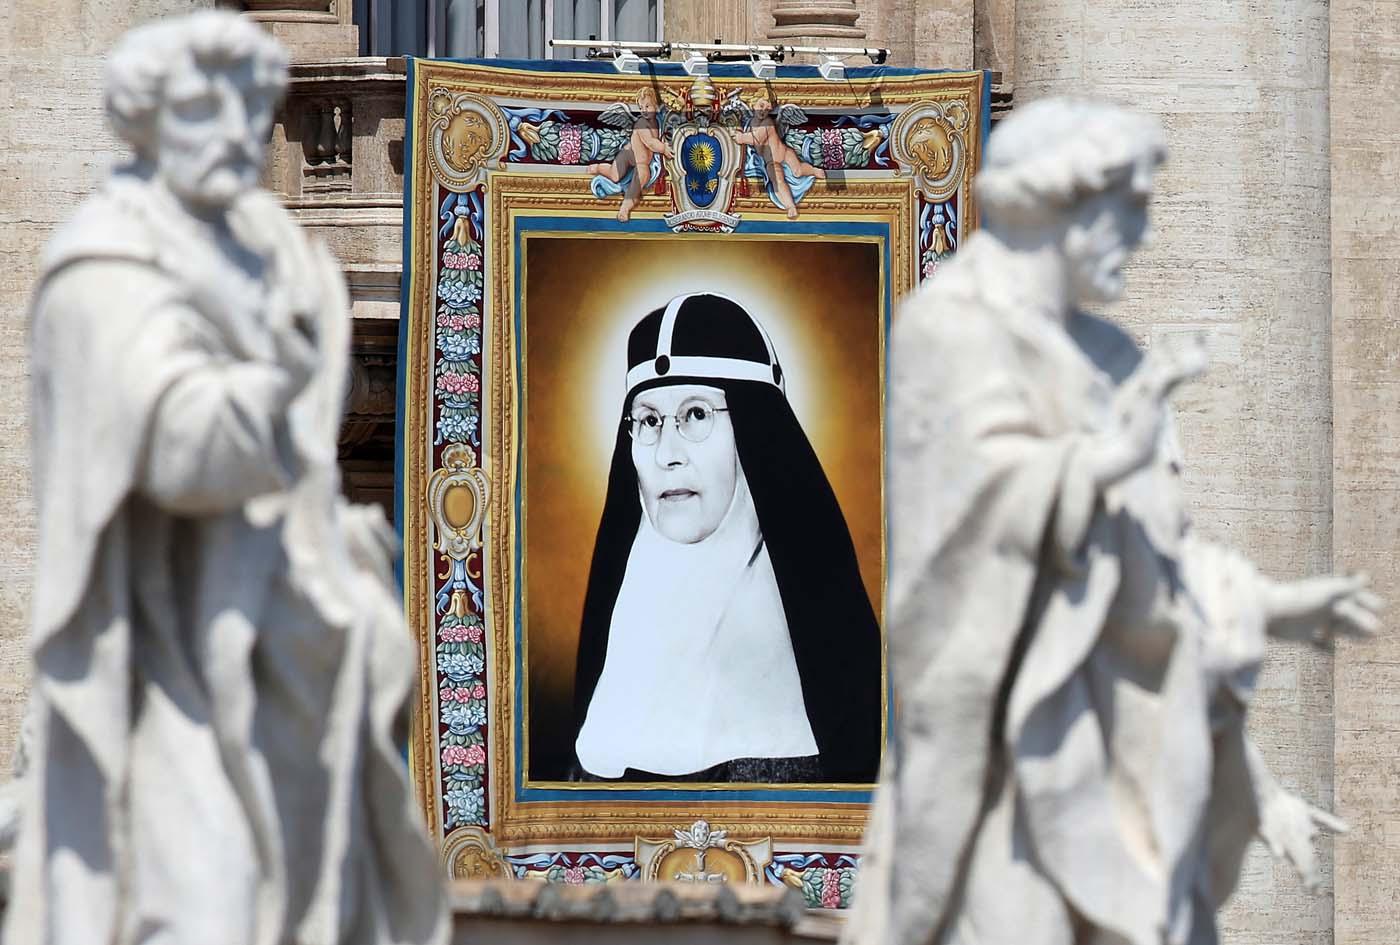 2016-06-05T100121Z_255248068_S1AETIDEPDAA_RTRMADP_3_POPE-CANONISATION